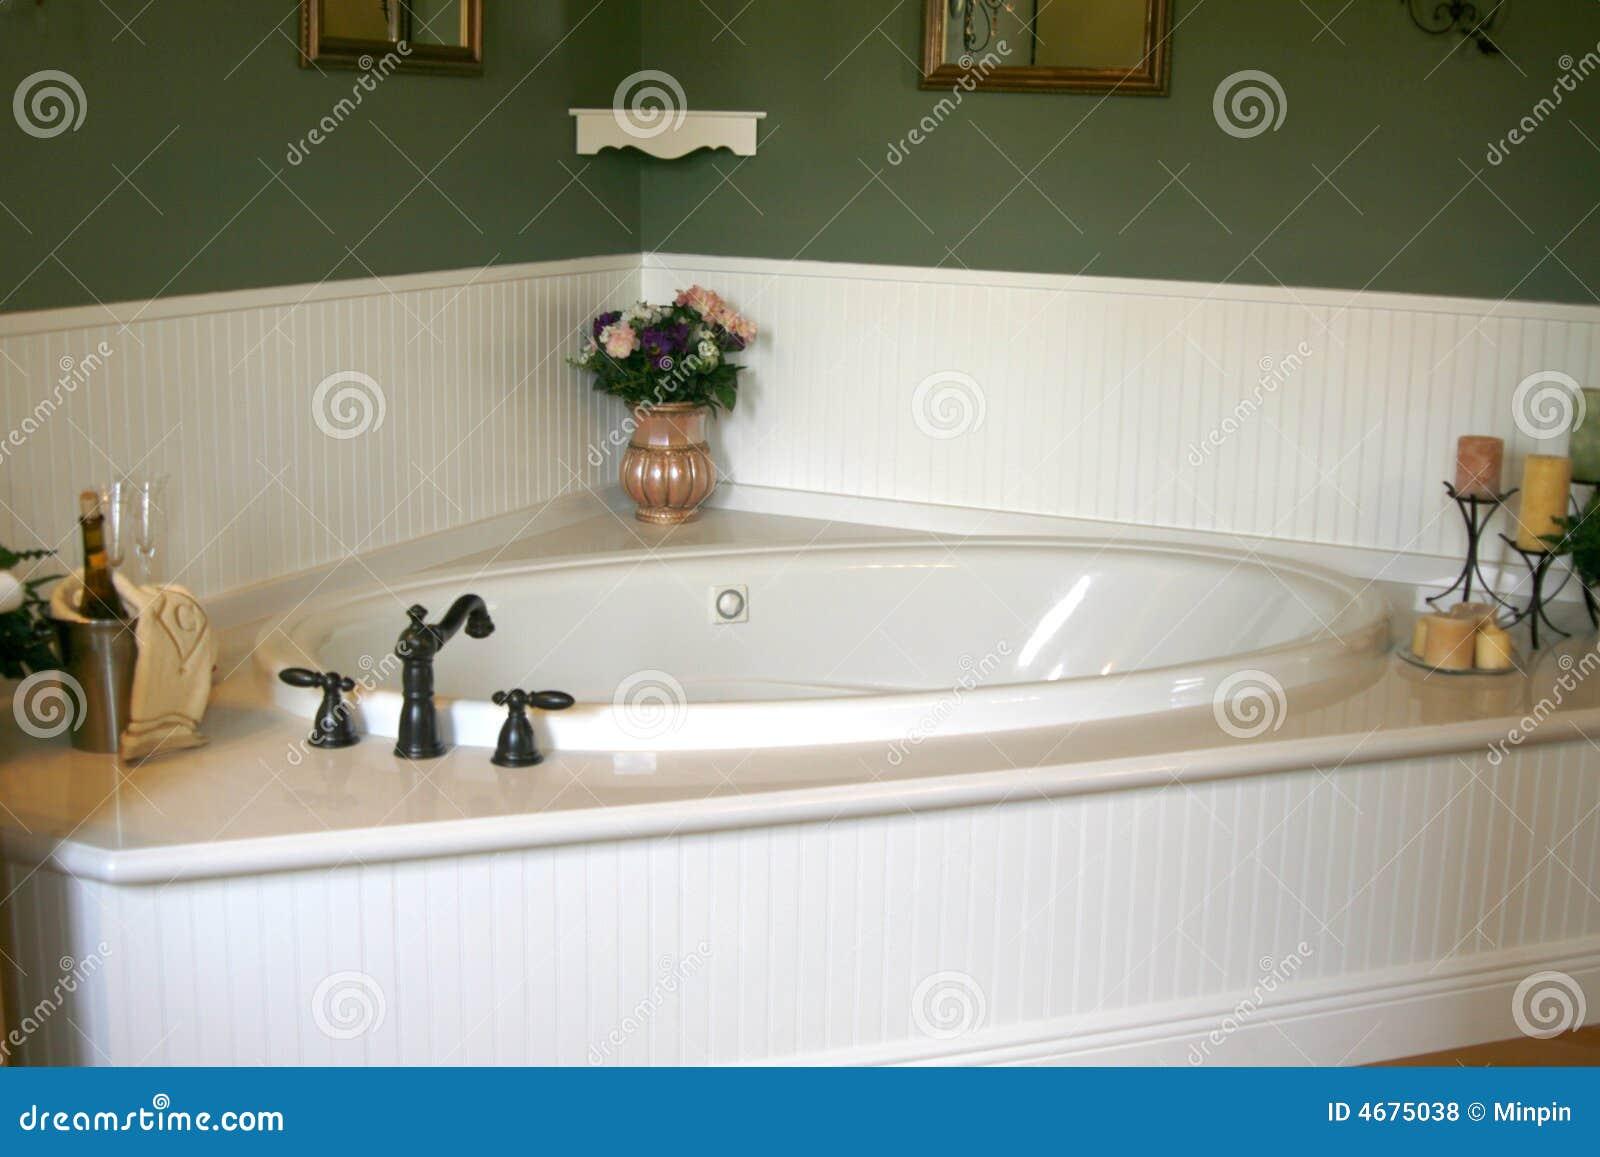 Vasca Da Bagno Con Piedini Usata : Vasca da bagno con piedini stile retr con piedini bianchi vasca